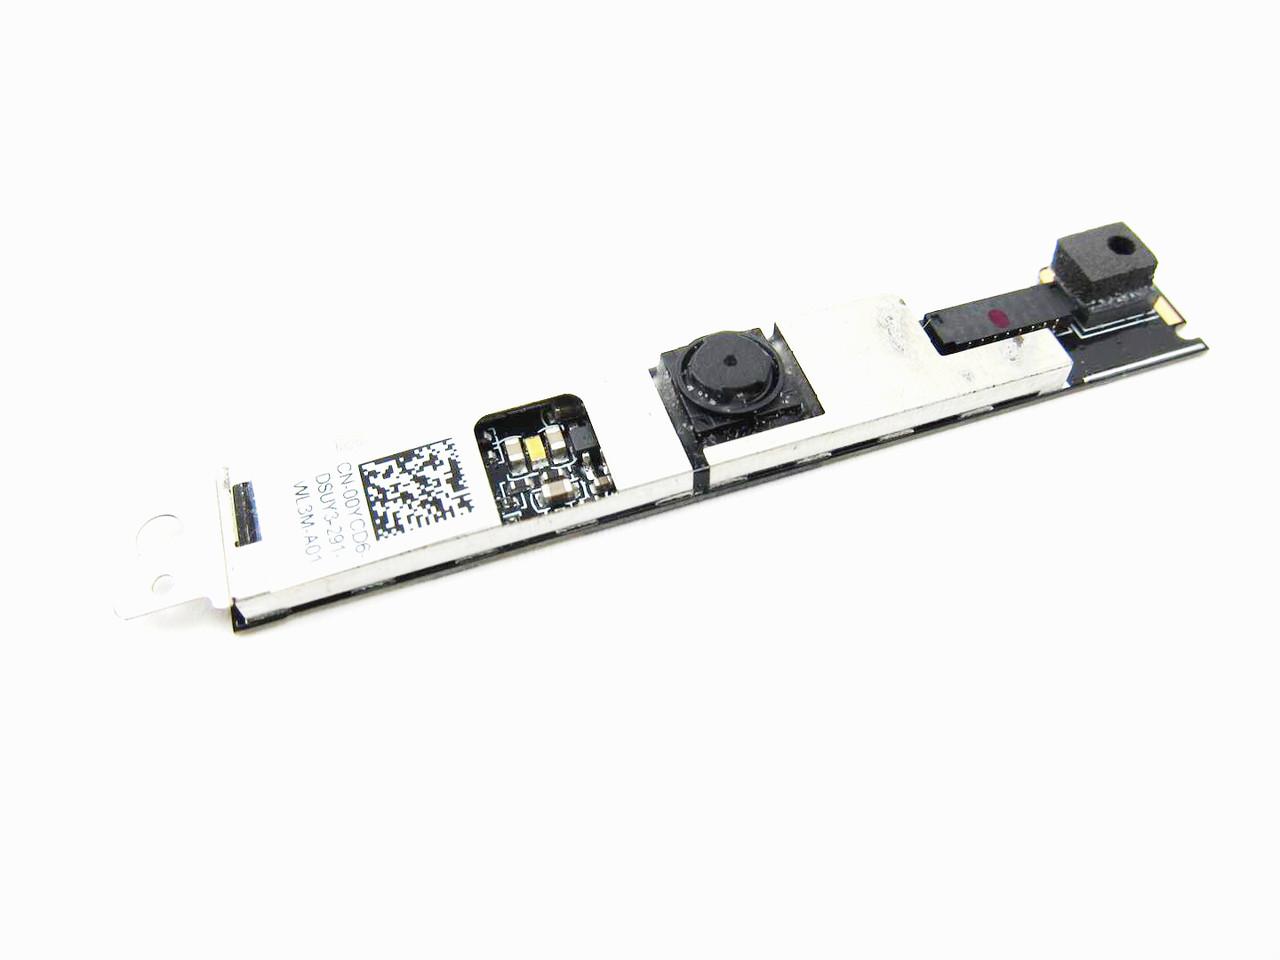 Dell Inspiron 17R 5720 / 7720 / 15R 5520 / 7520 Webcam Camera - 0YCD6